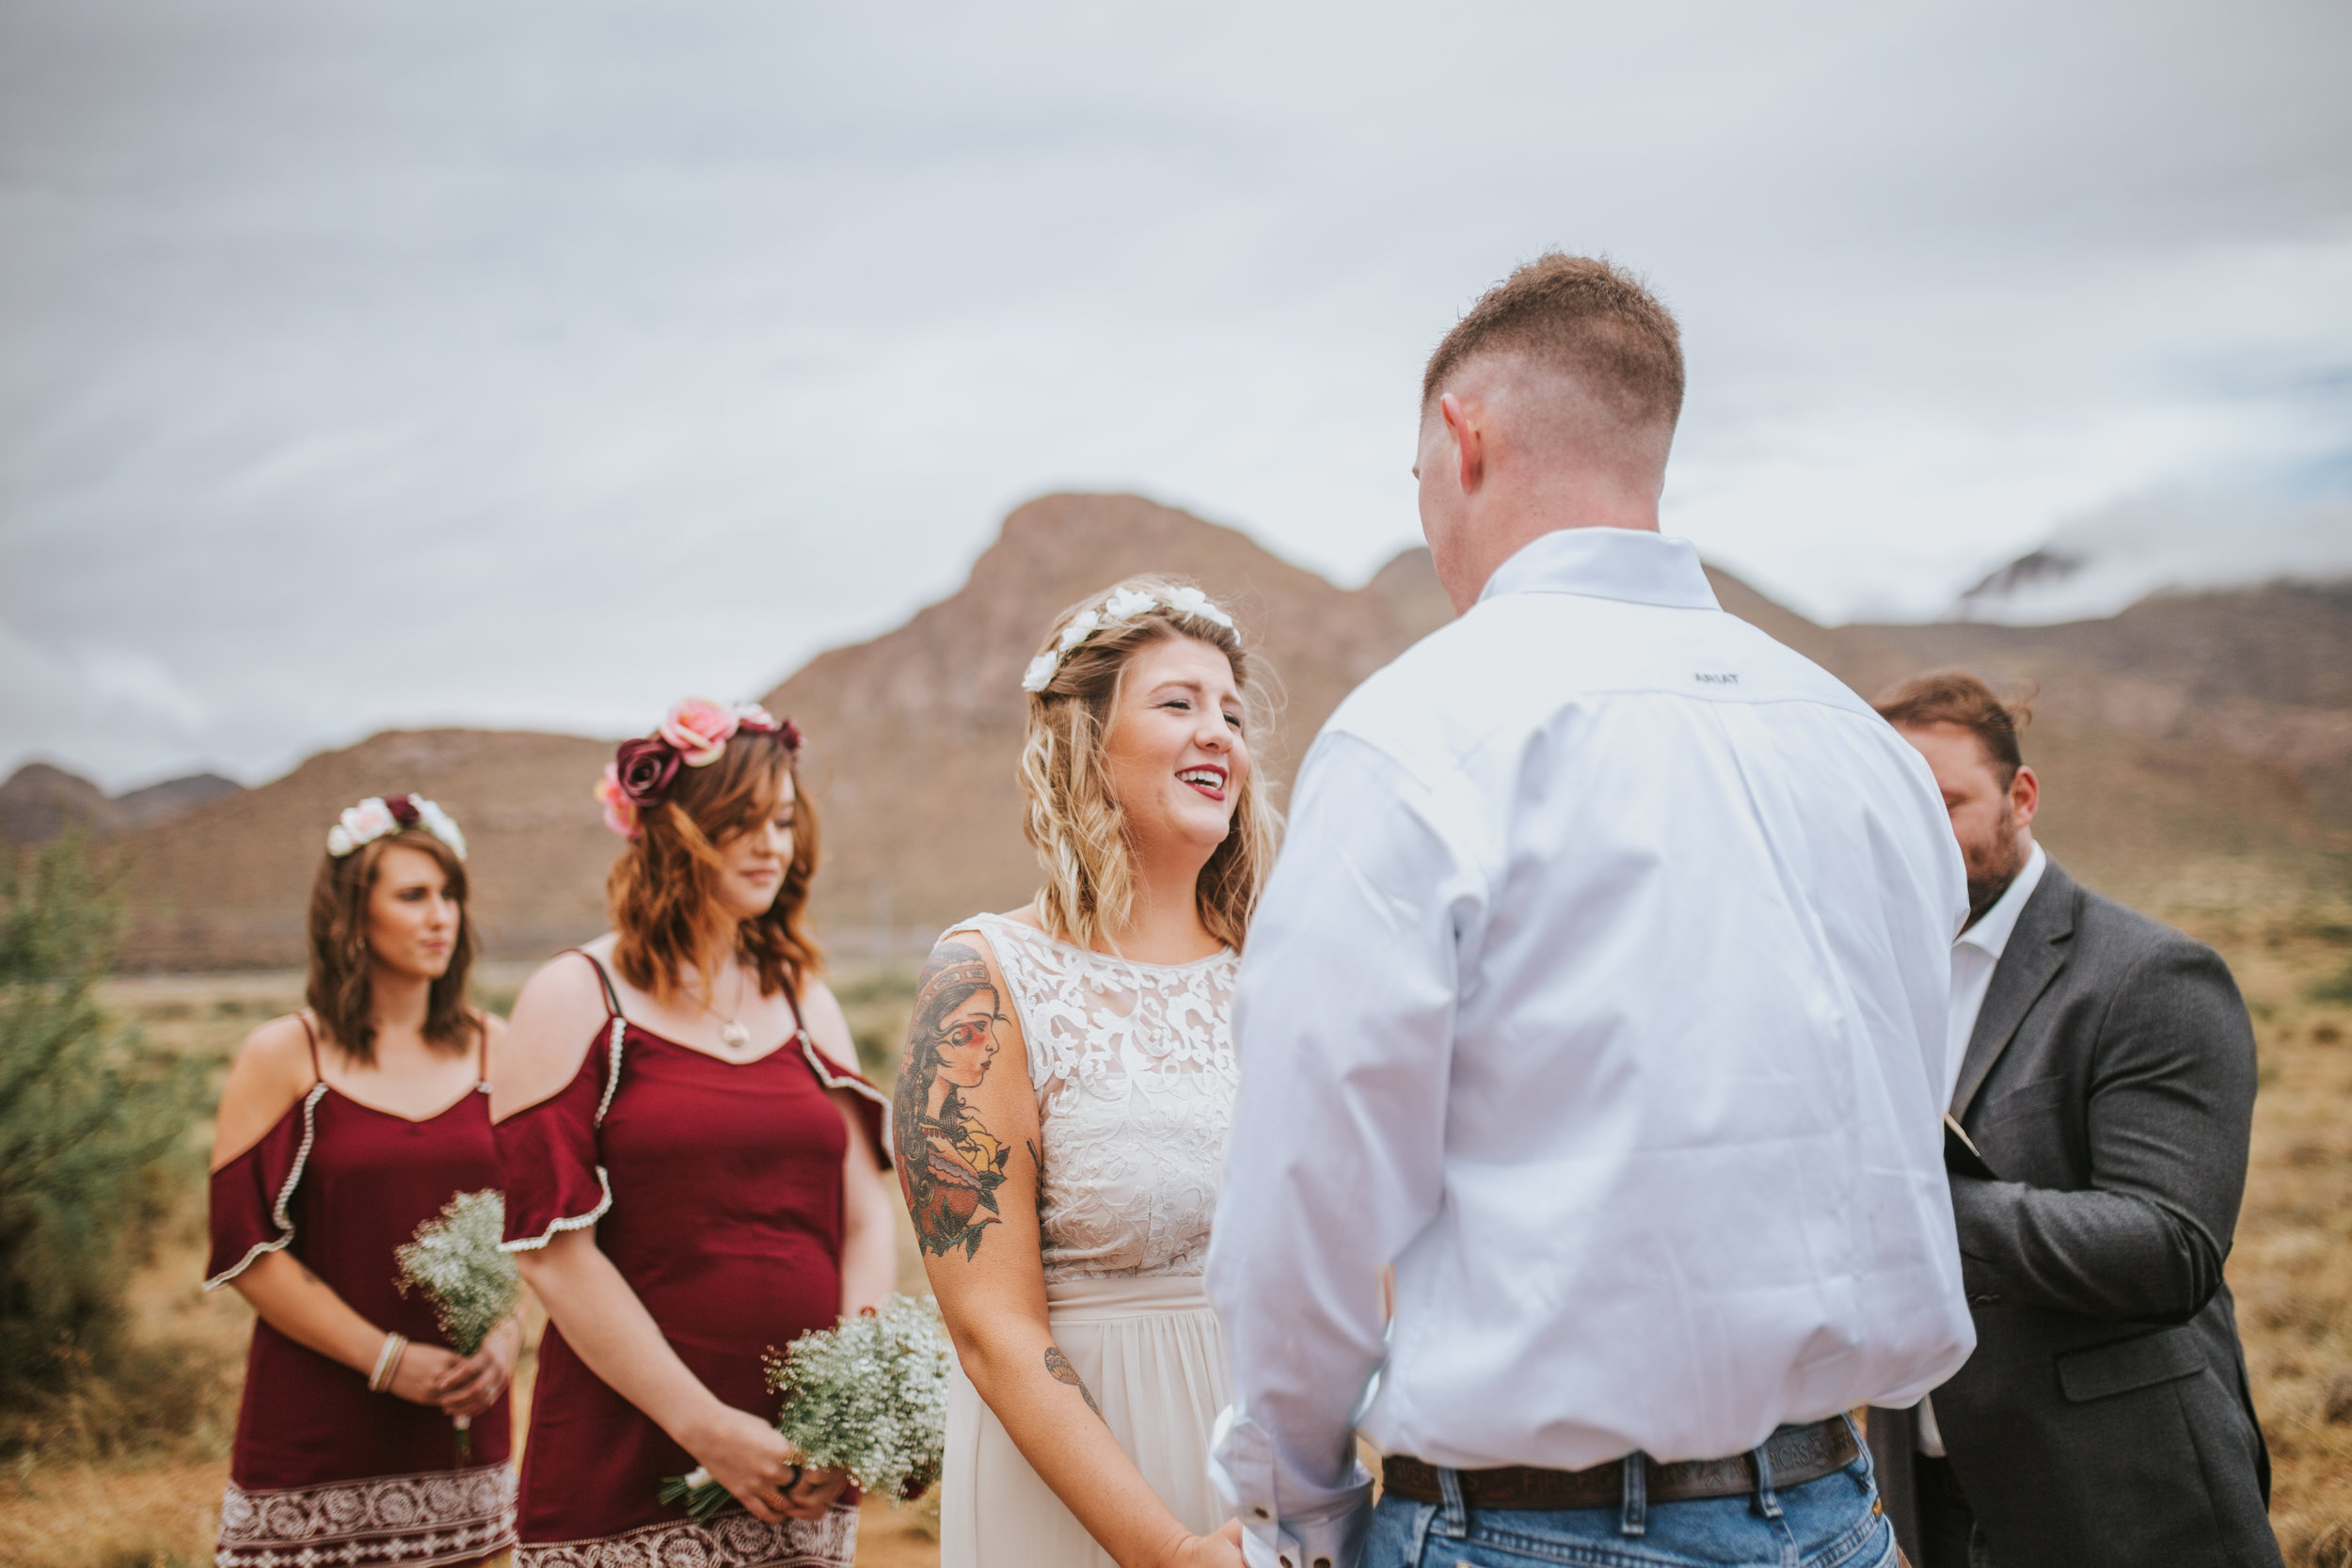 el-paso-texas-wedding-photographer-14